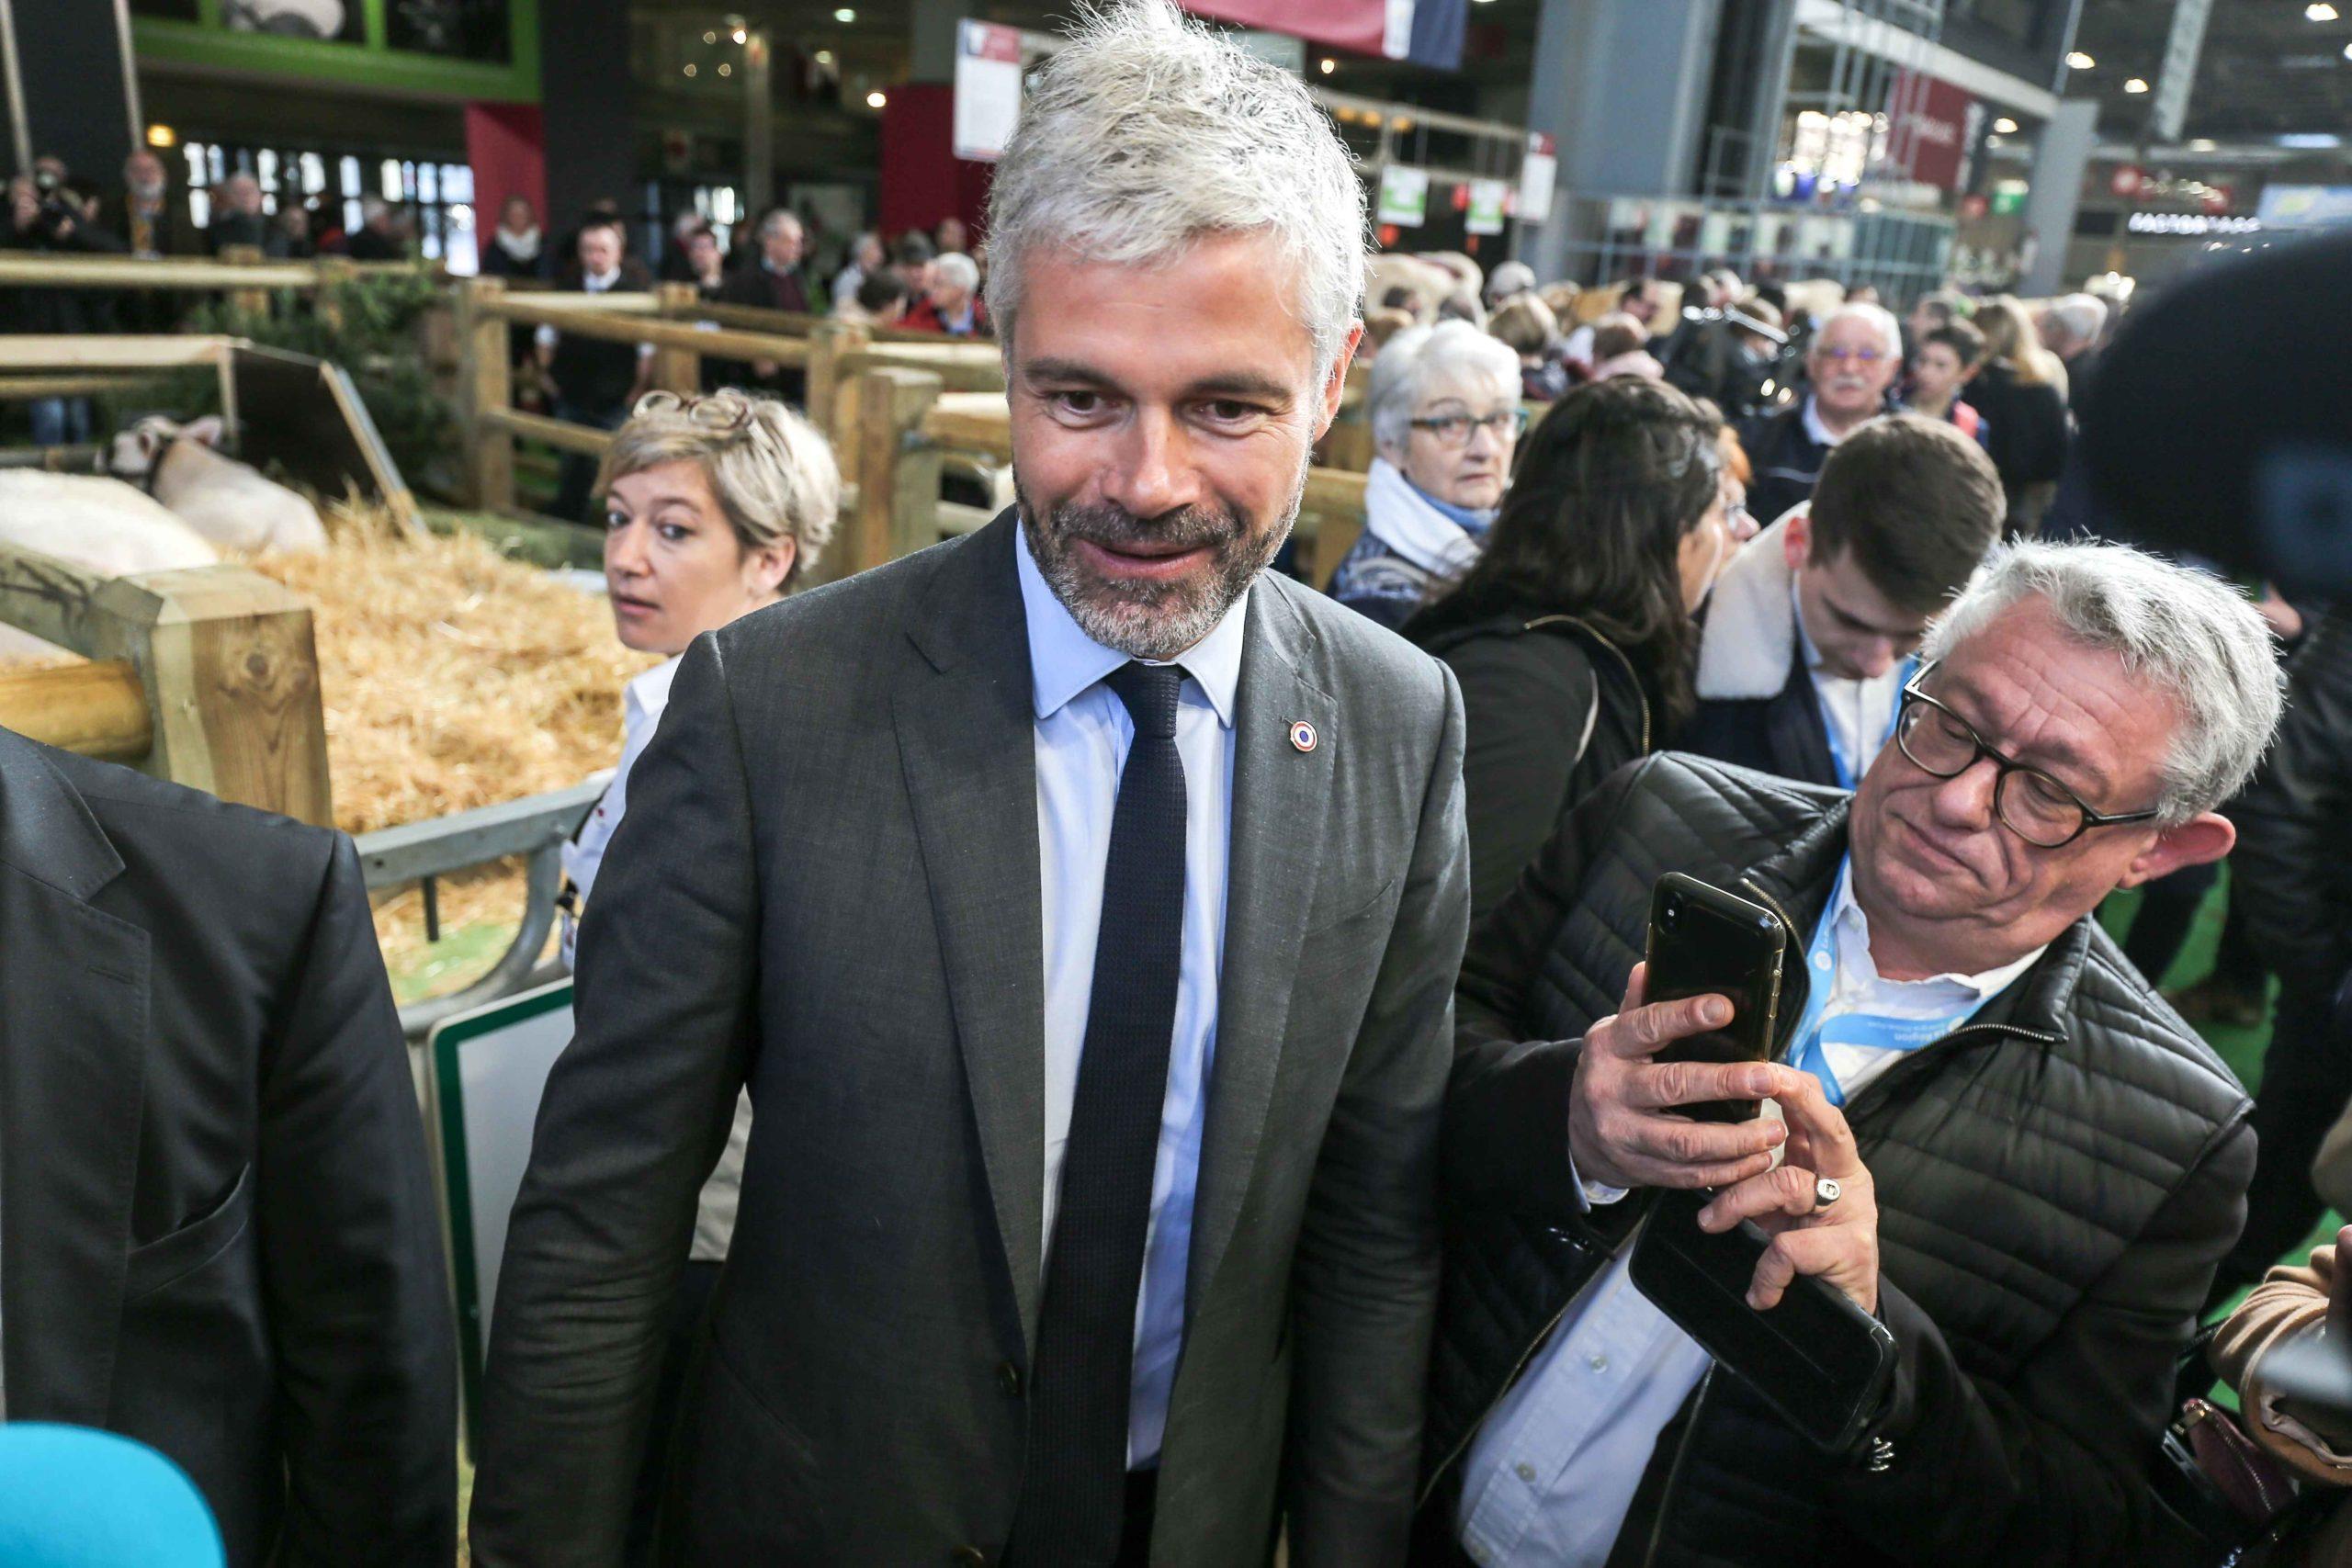 President of France's administrative region Auvergne-Rhone-Alpes Laurent Wauquiez (C) visits the international Agriculture Fair in Paris on February 25, 2020.